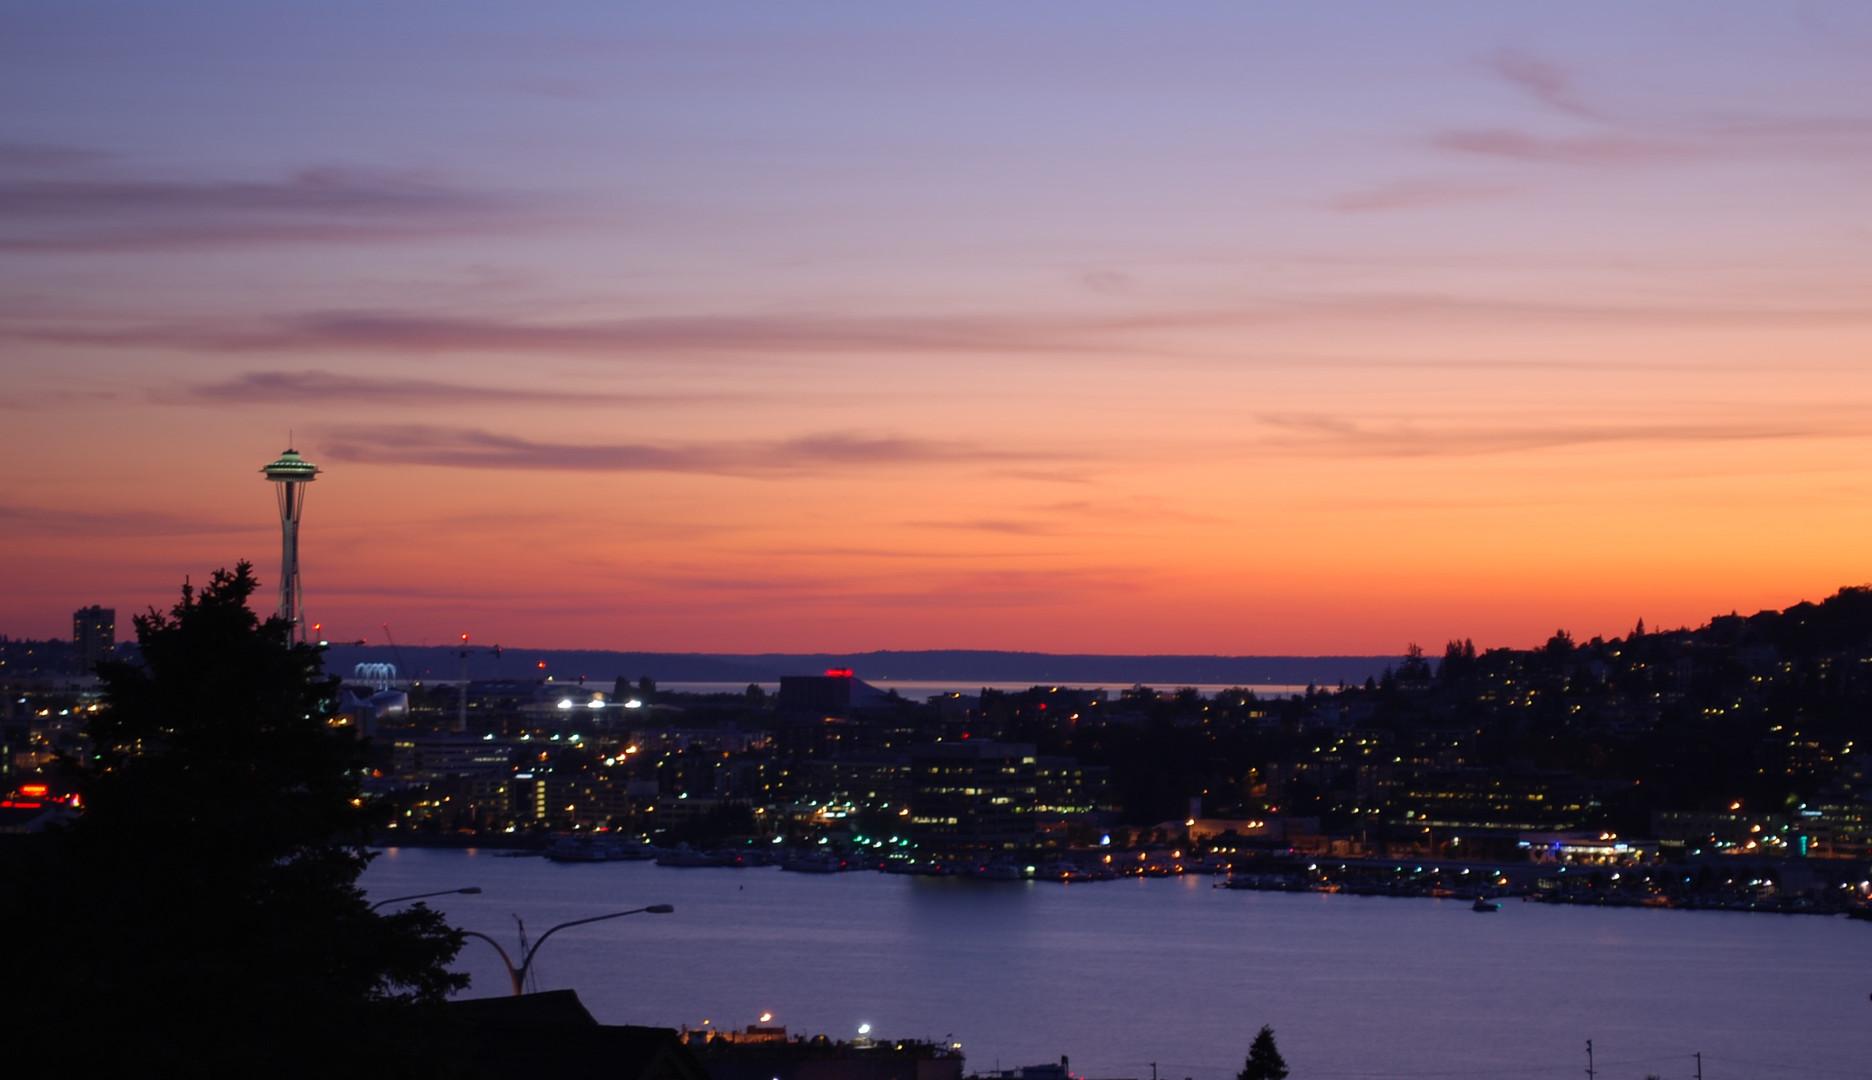 Incedible Sunset Views